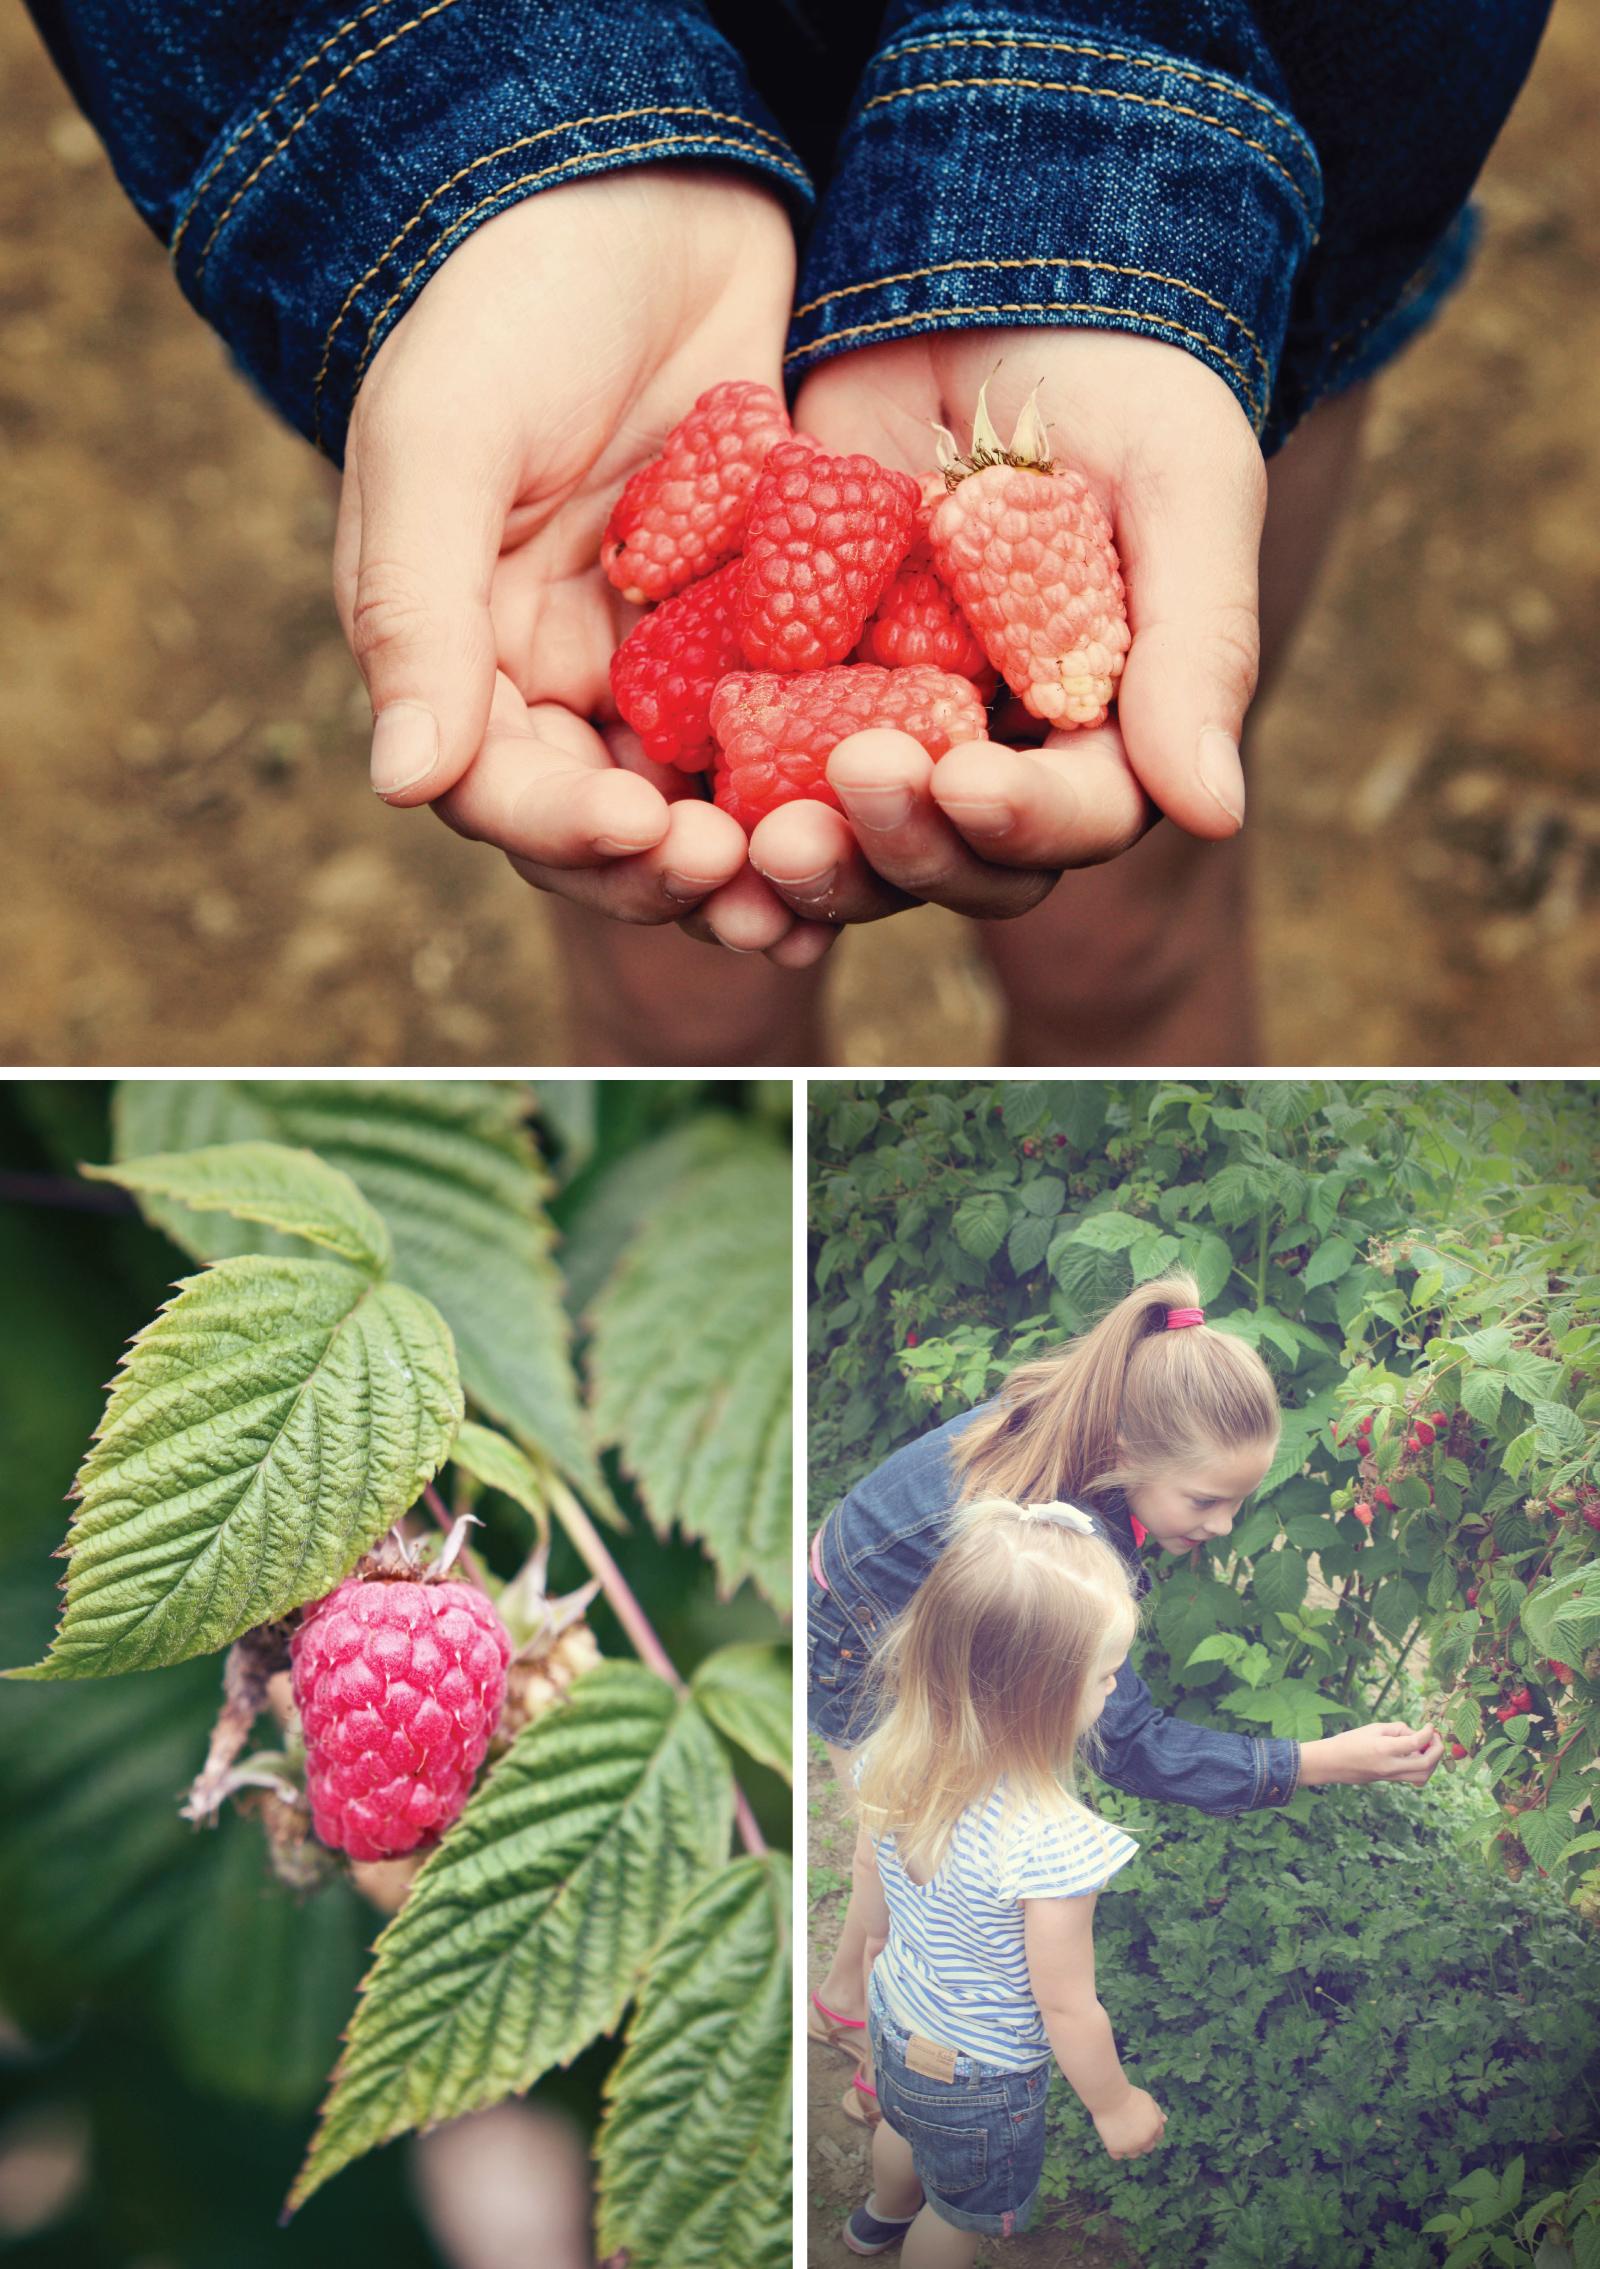 gni-berry2.jpg